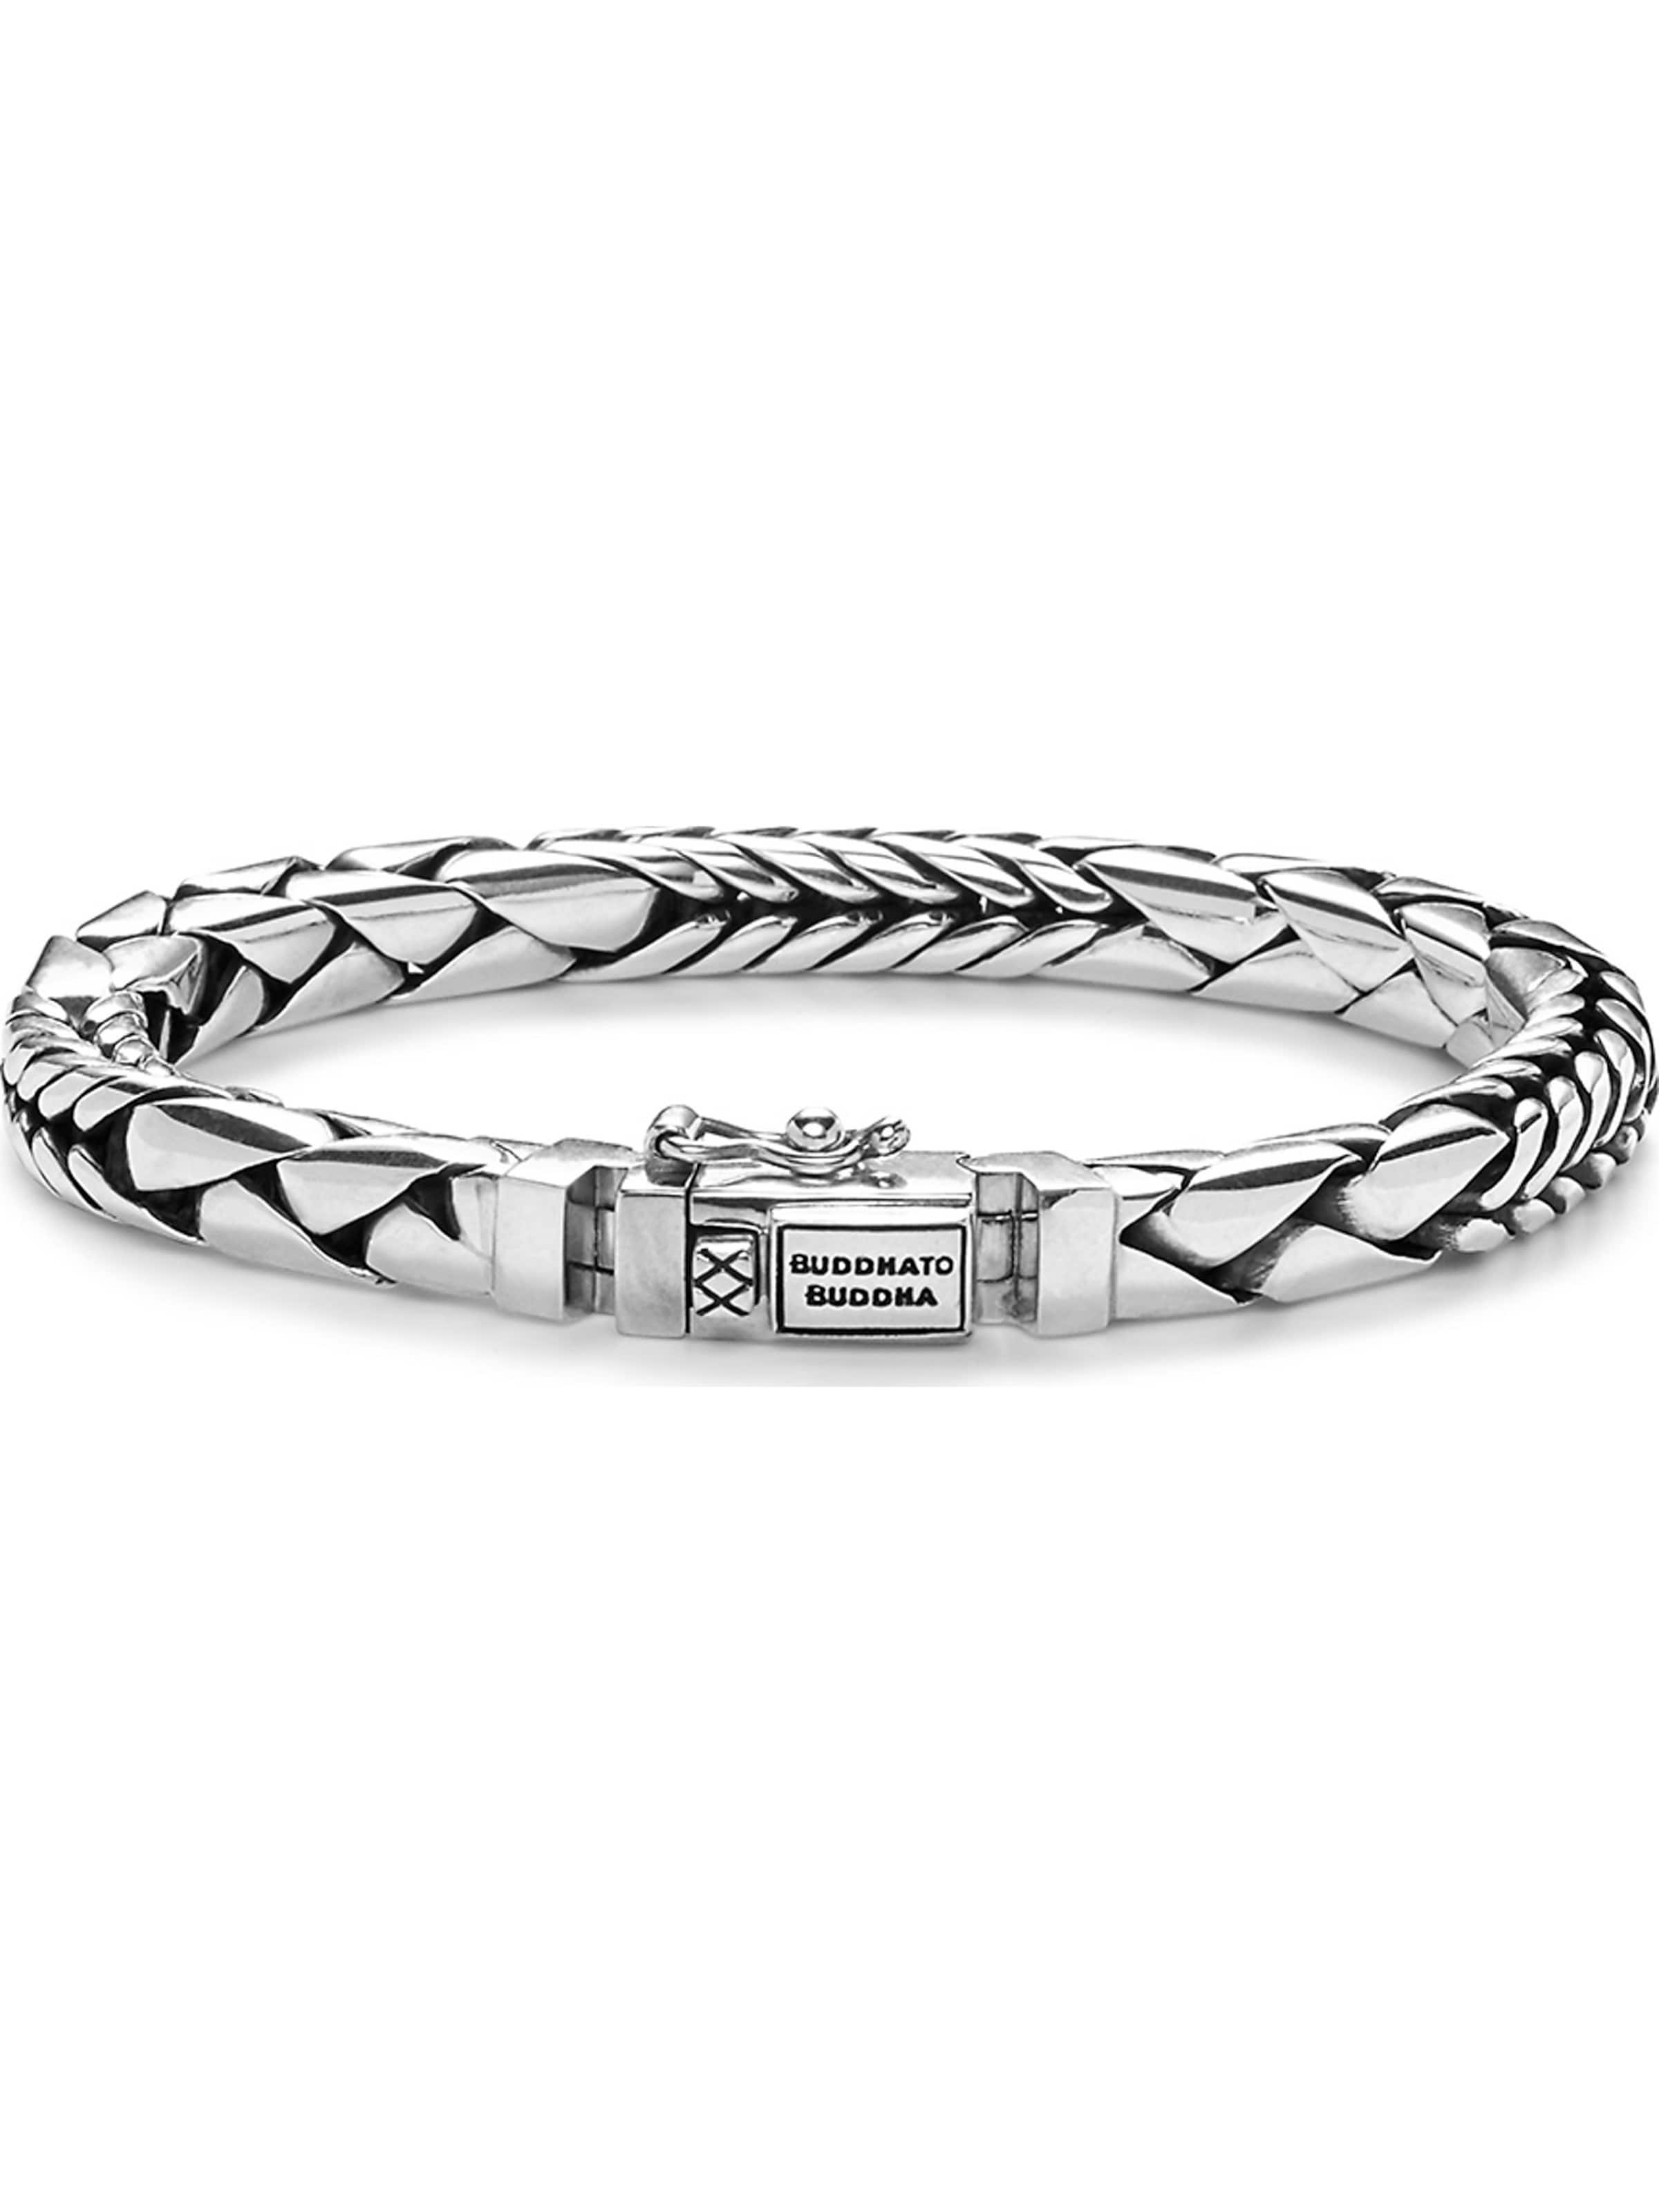 Armband Buddha To In In Silber To Buddha Silber Armband 13TlKFJcu